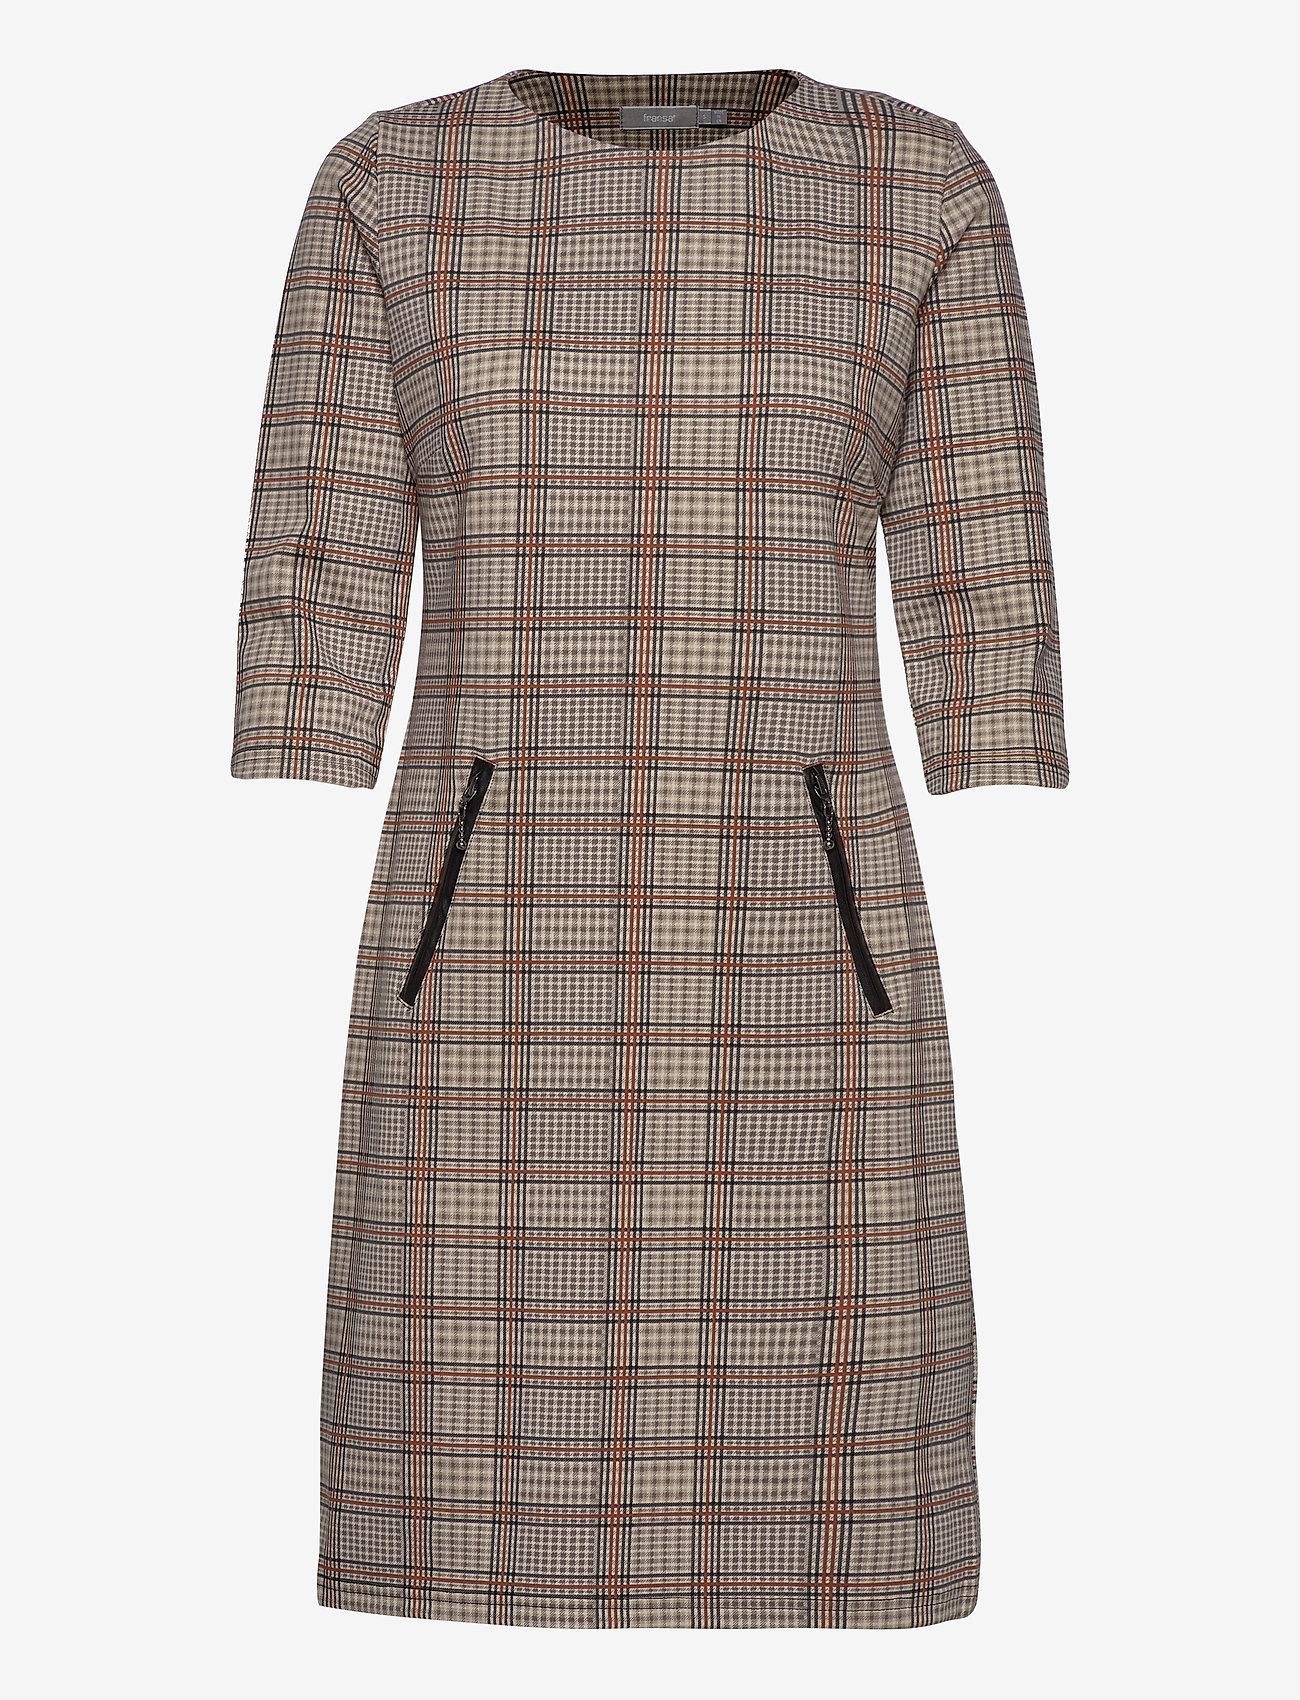 Frlecheck 3 Dress   - Fransa -  Women's Dresses Offer